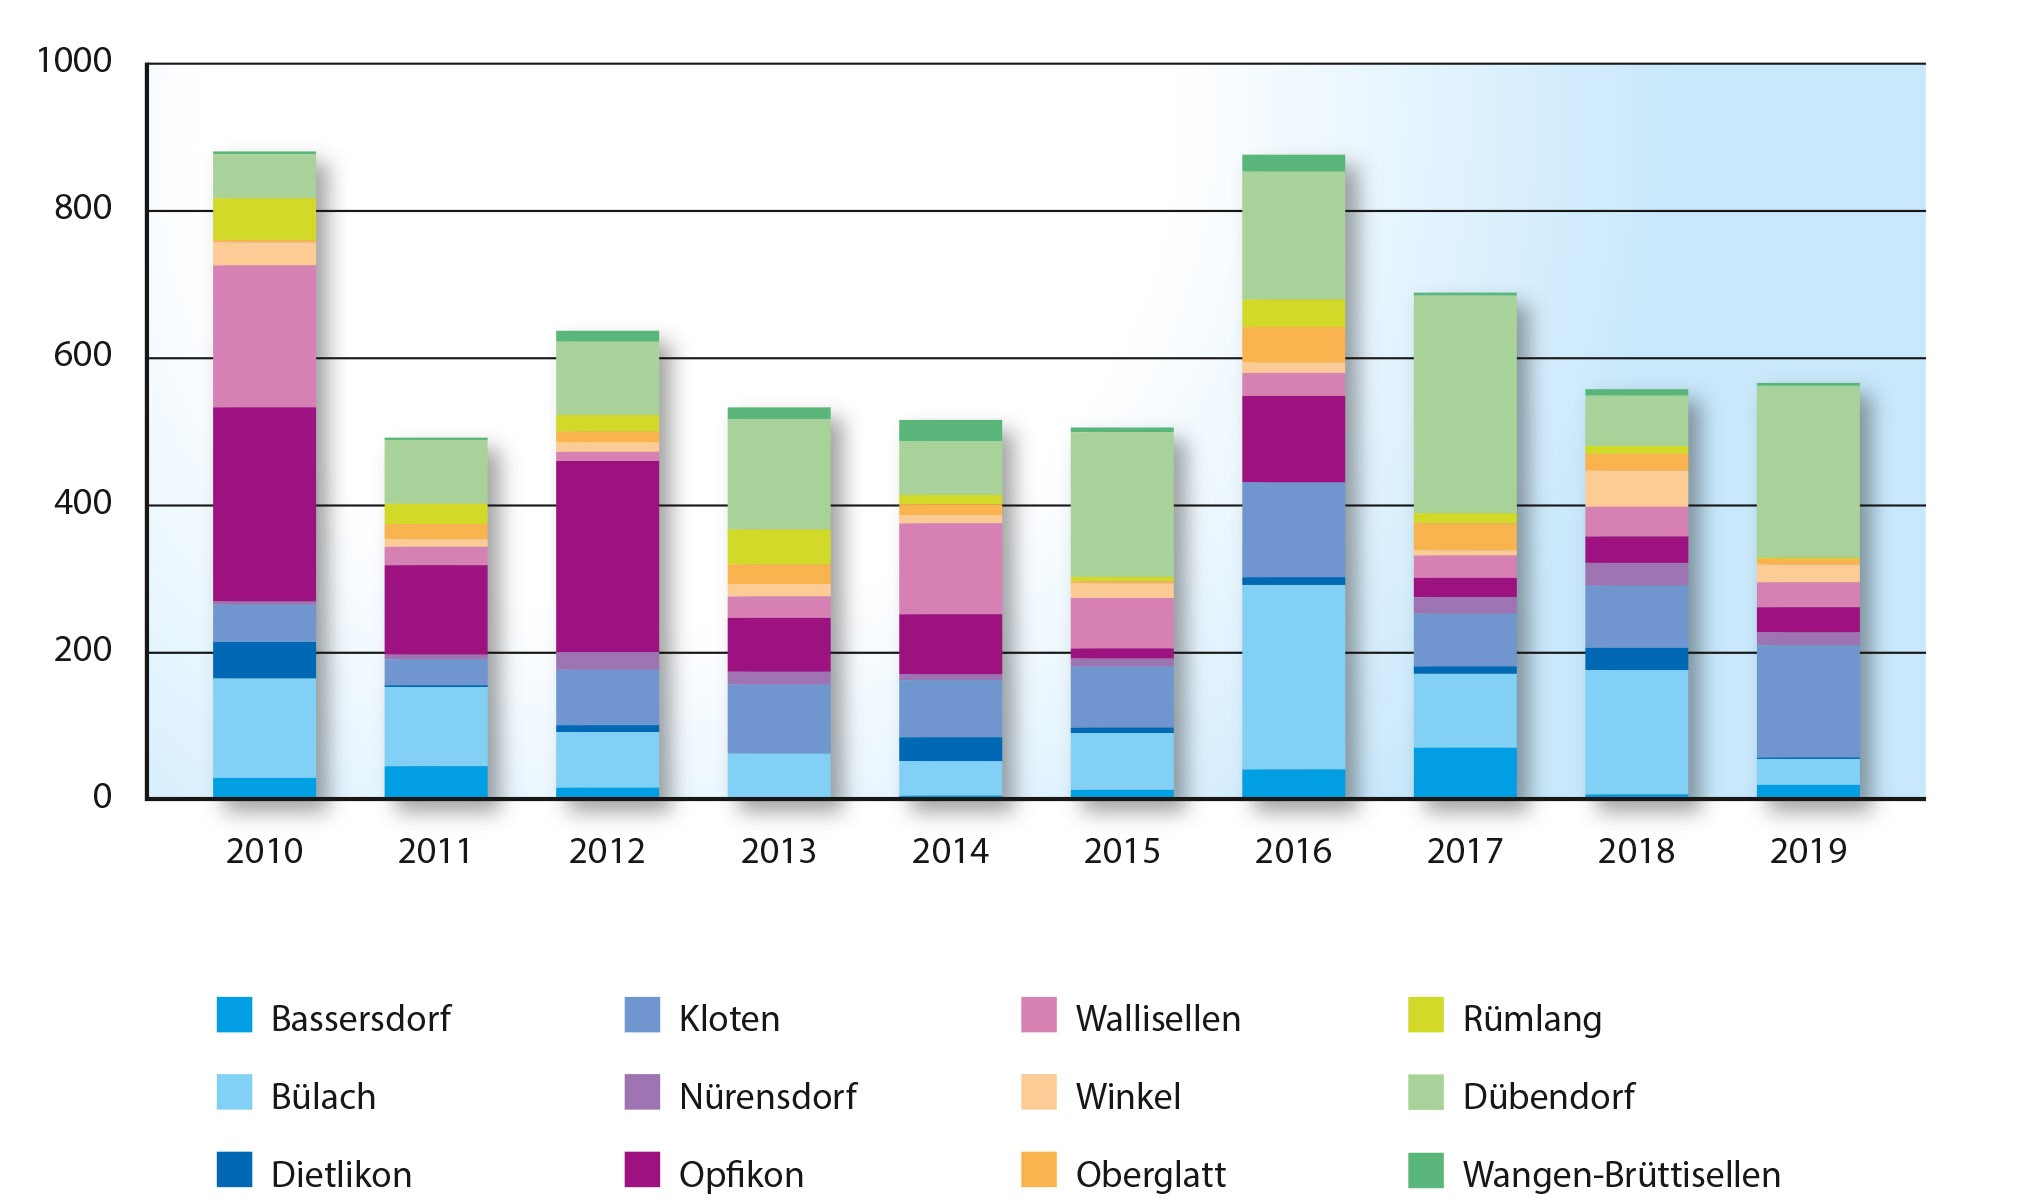 Hochbau total (geplante Bausumme in Mio. CHF)